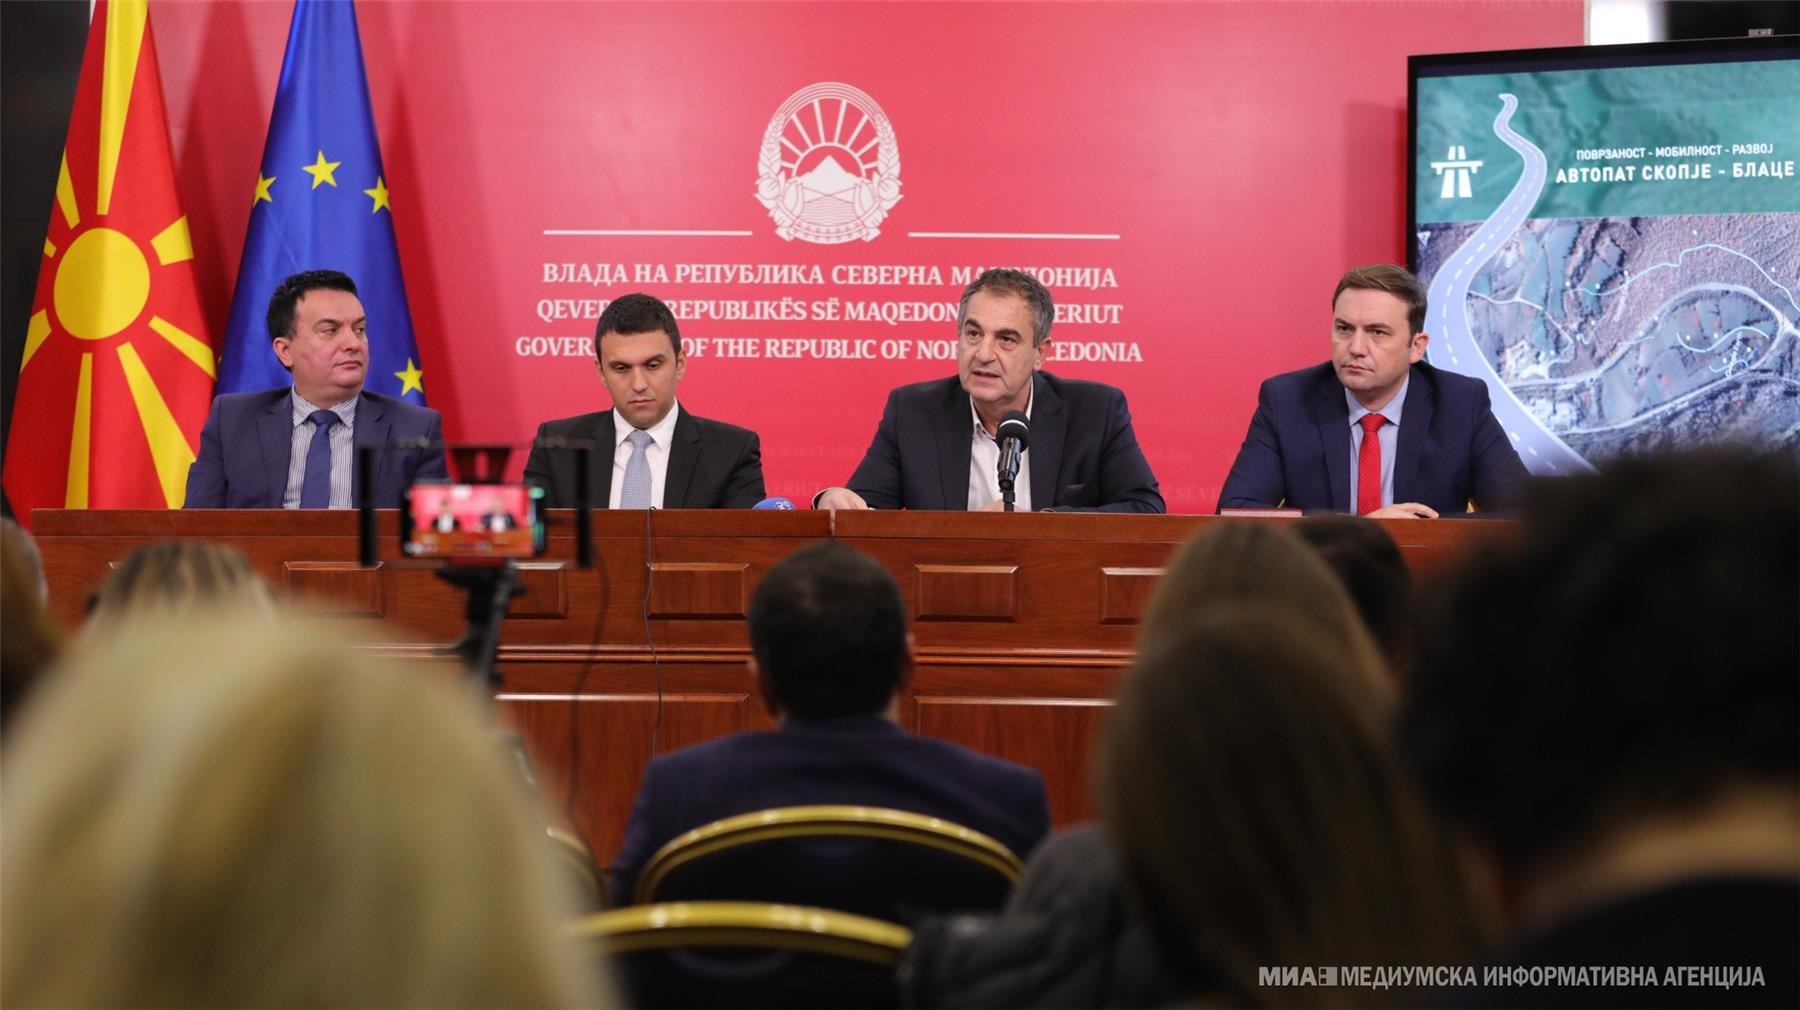 Потпишан договор за изградба на првите два километра од автопатот Скопје-Блаце